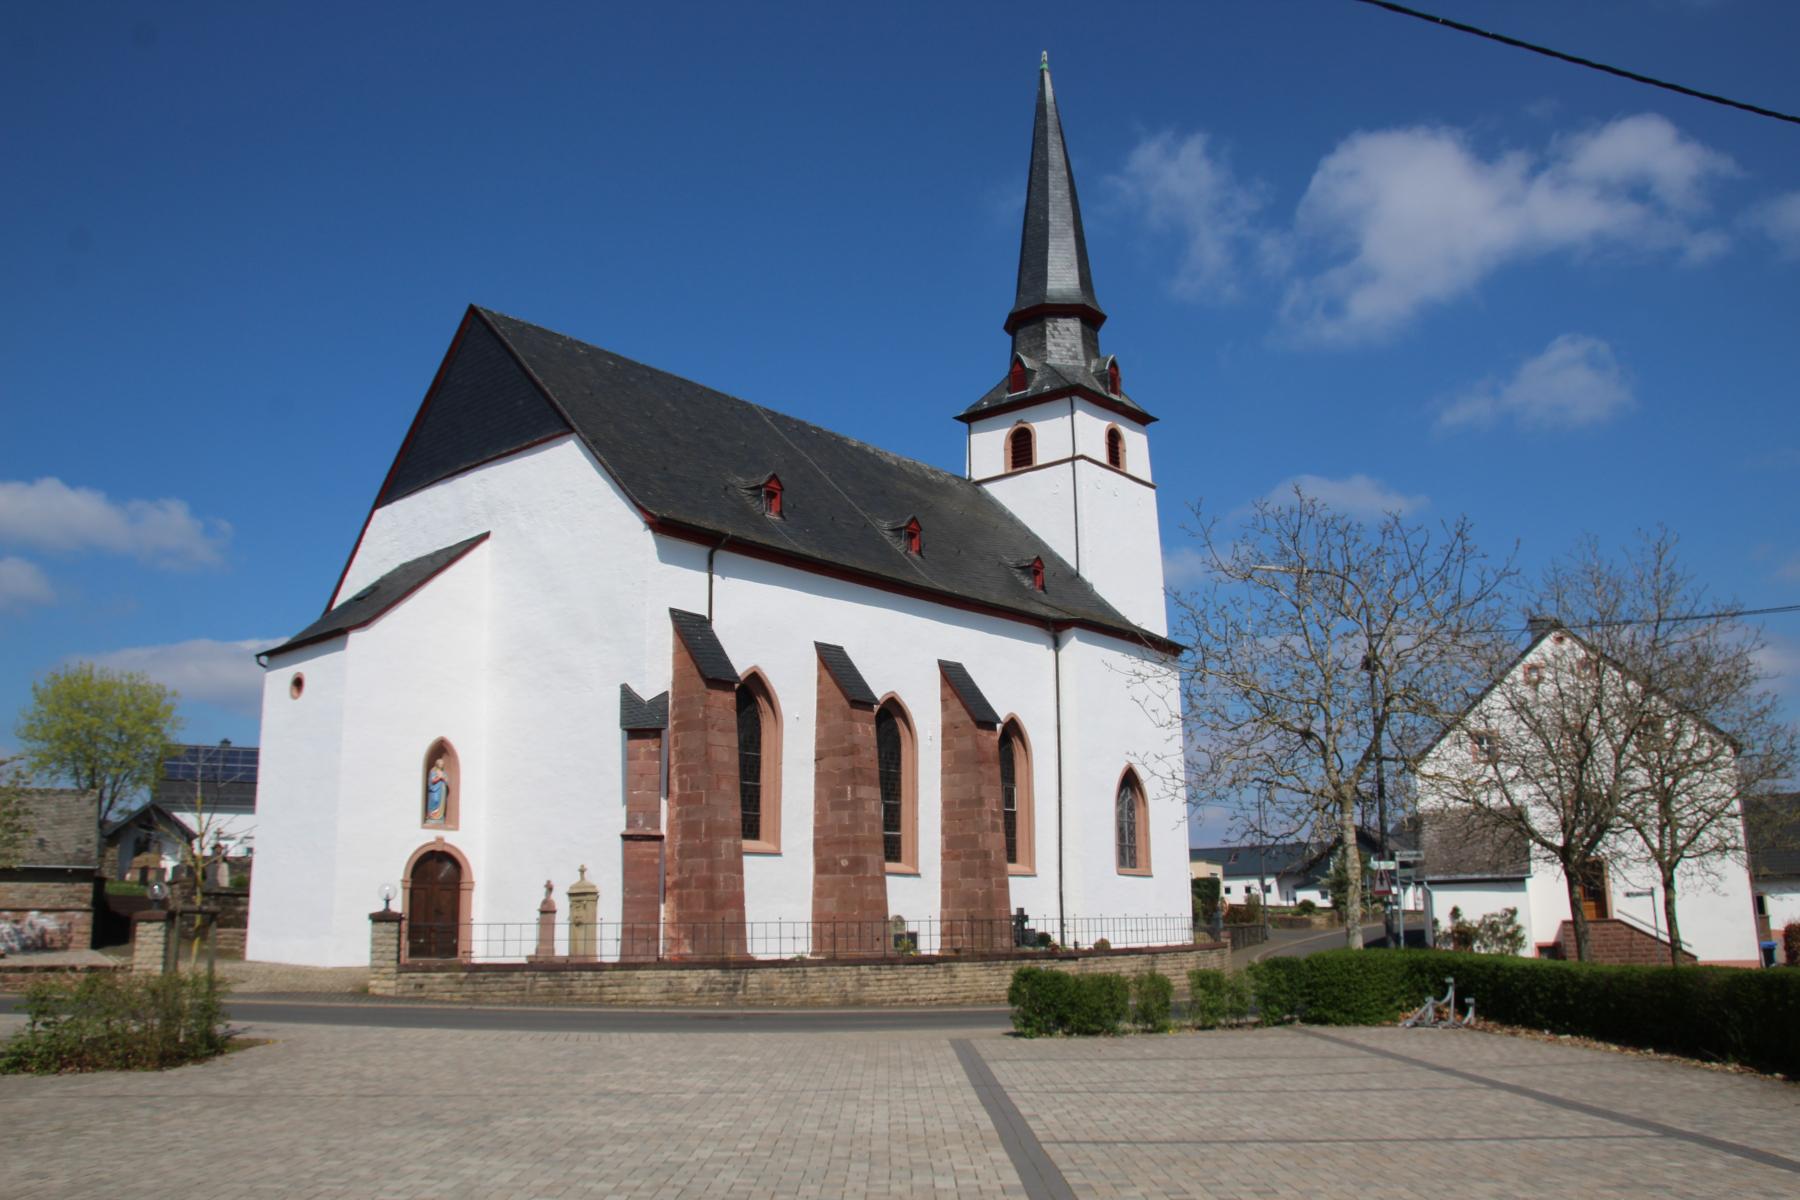 Wallfahrtskirche Sankt Marien